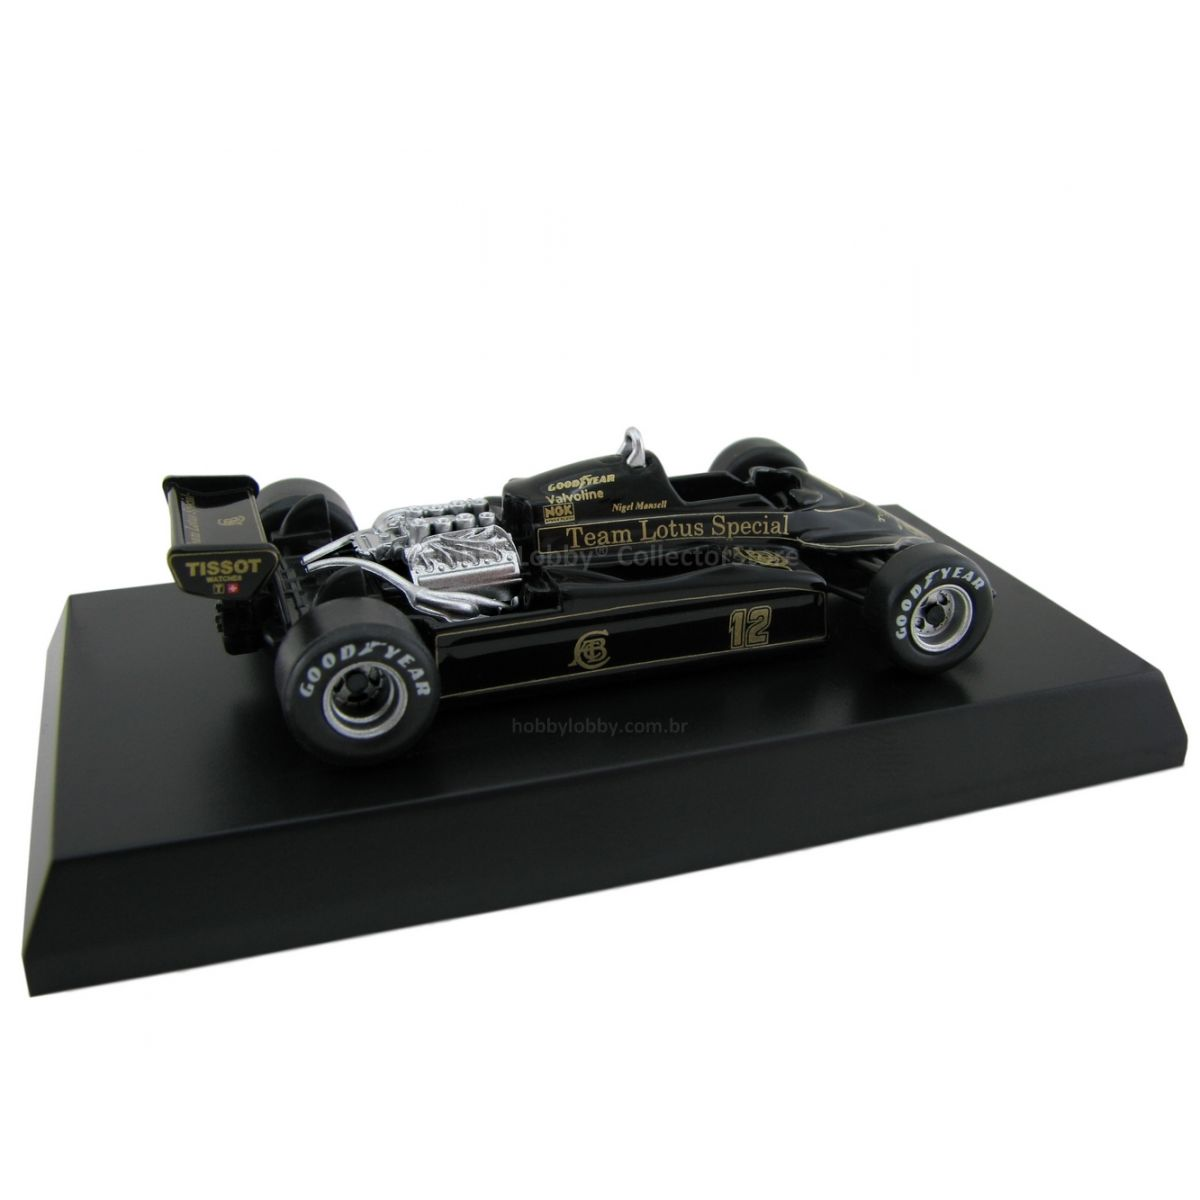 Kyosho - Classic Team Lotus - Lotus 91  - Hobby Lobby CollectorStore